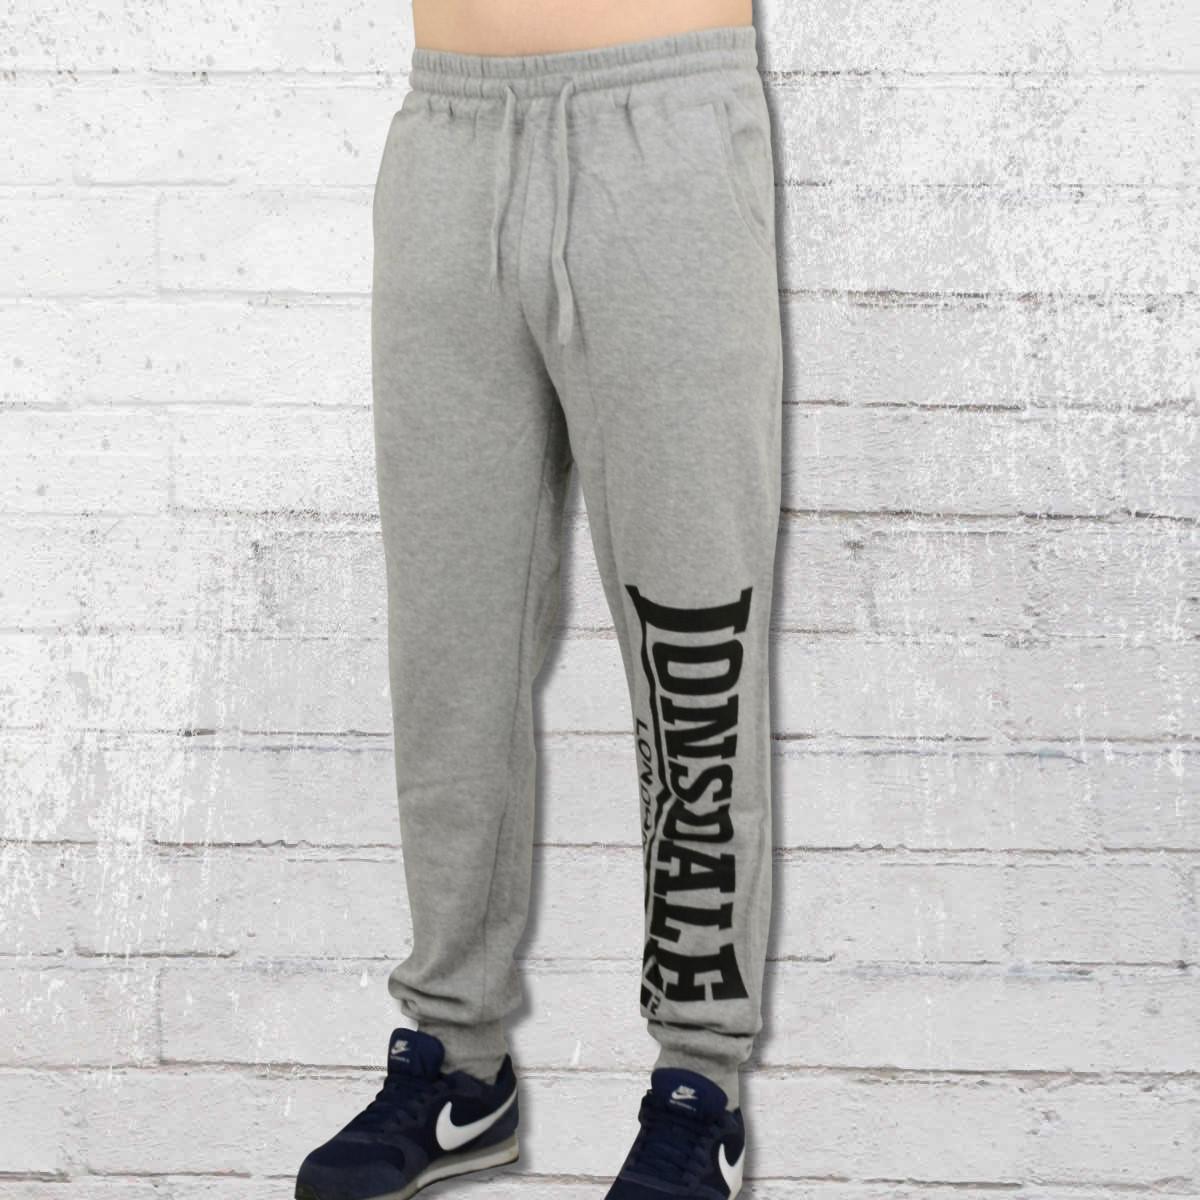 jetzt bestellen lonsdale london herren jogginghose logo large grau meliert krasse. Black Bedroom Furniture Sets. Home Design Ideas